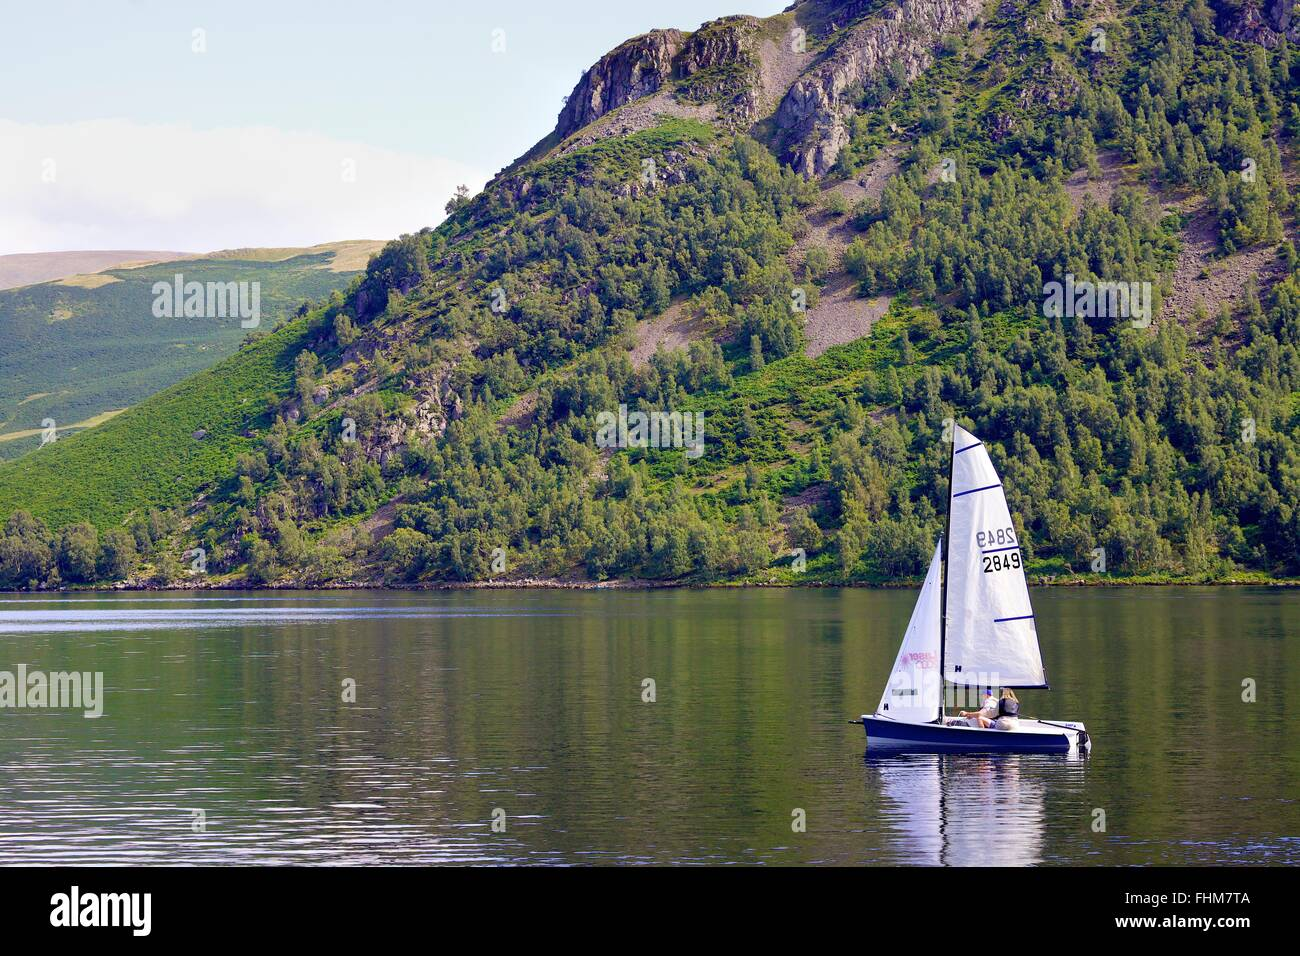 Lake District National Park. Dinghy sailing on lake Ullswater. - Stock Image